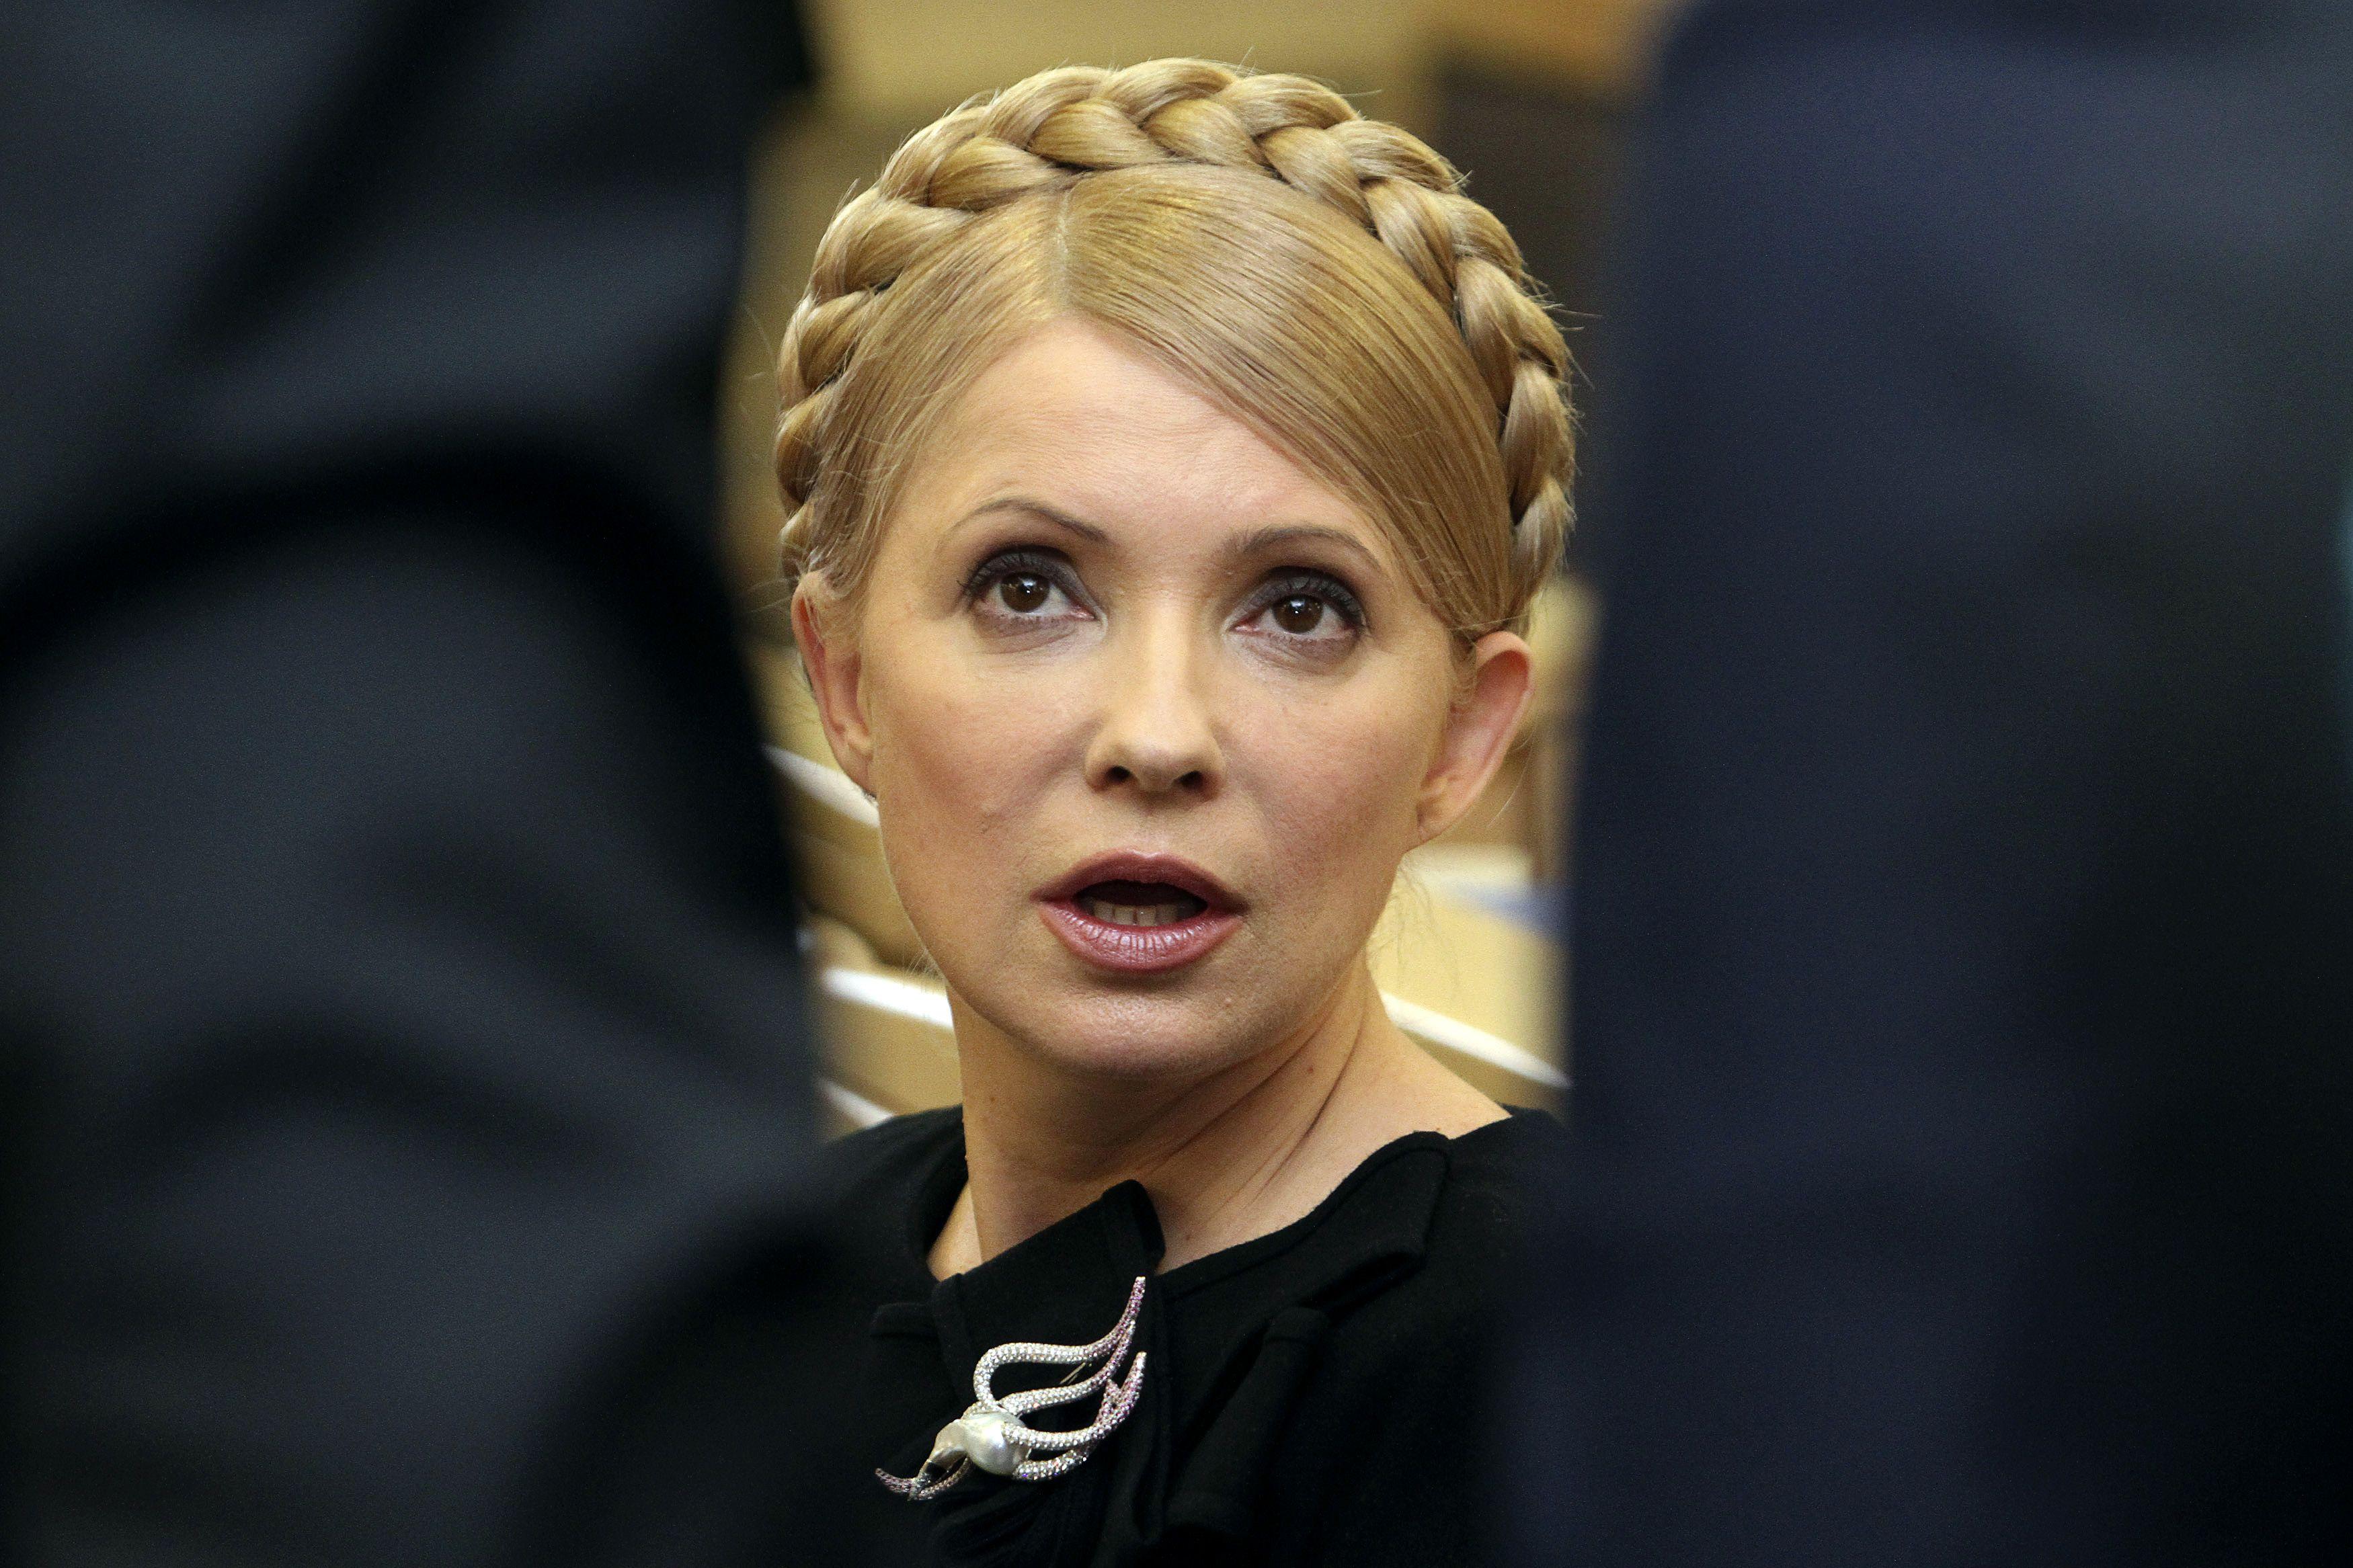 Скандал: соратника Тимошенко избили до полусмерти